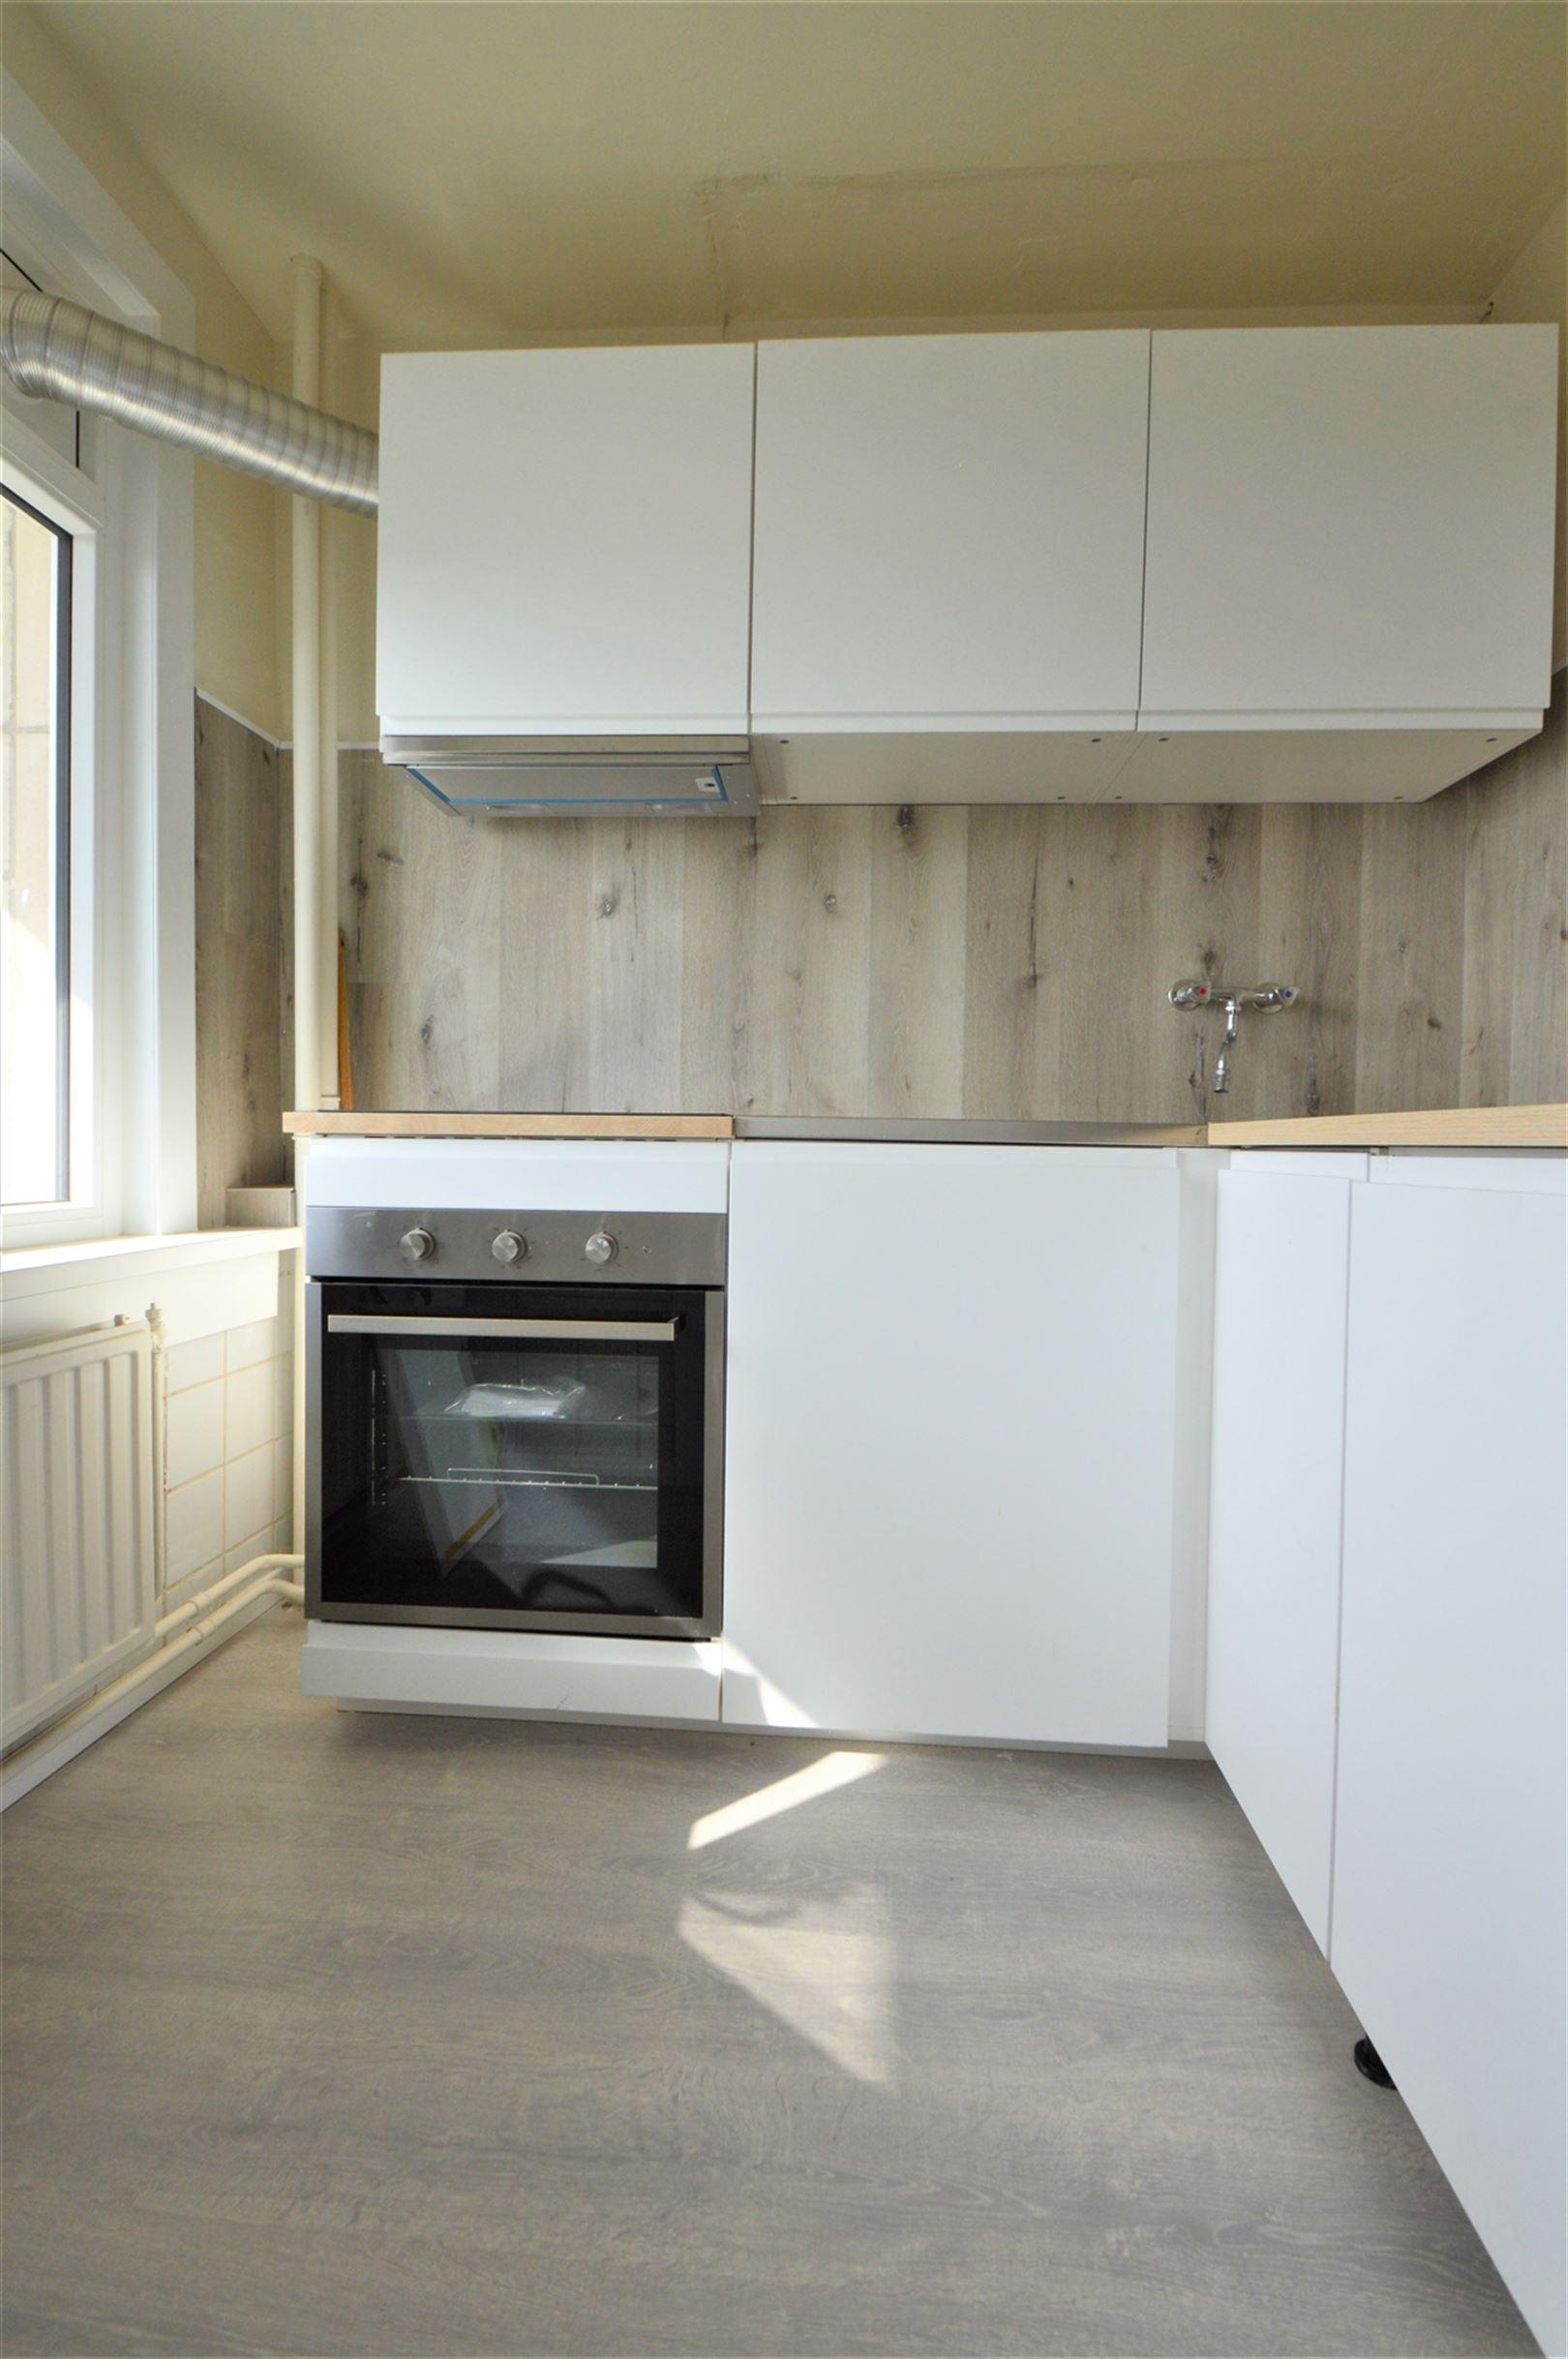 Foto 5 : Flat/studio te 9200 Dendermonde (België) - Prijs € 500